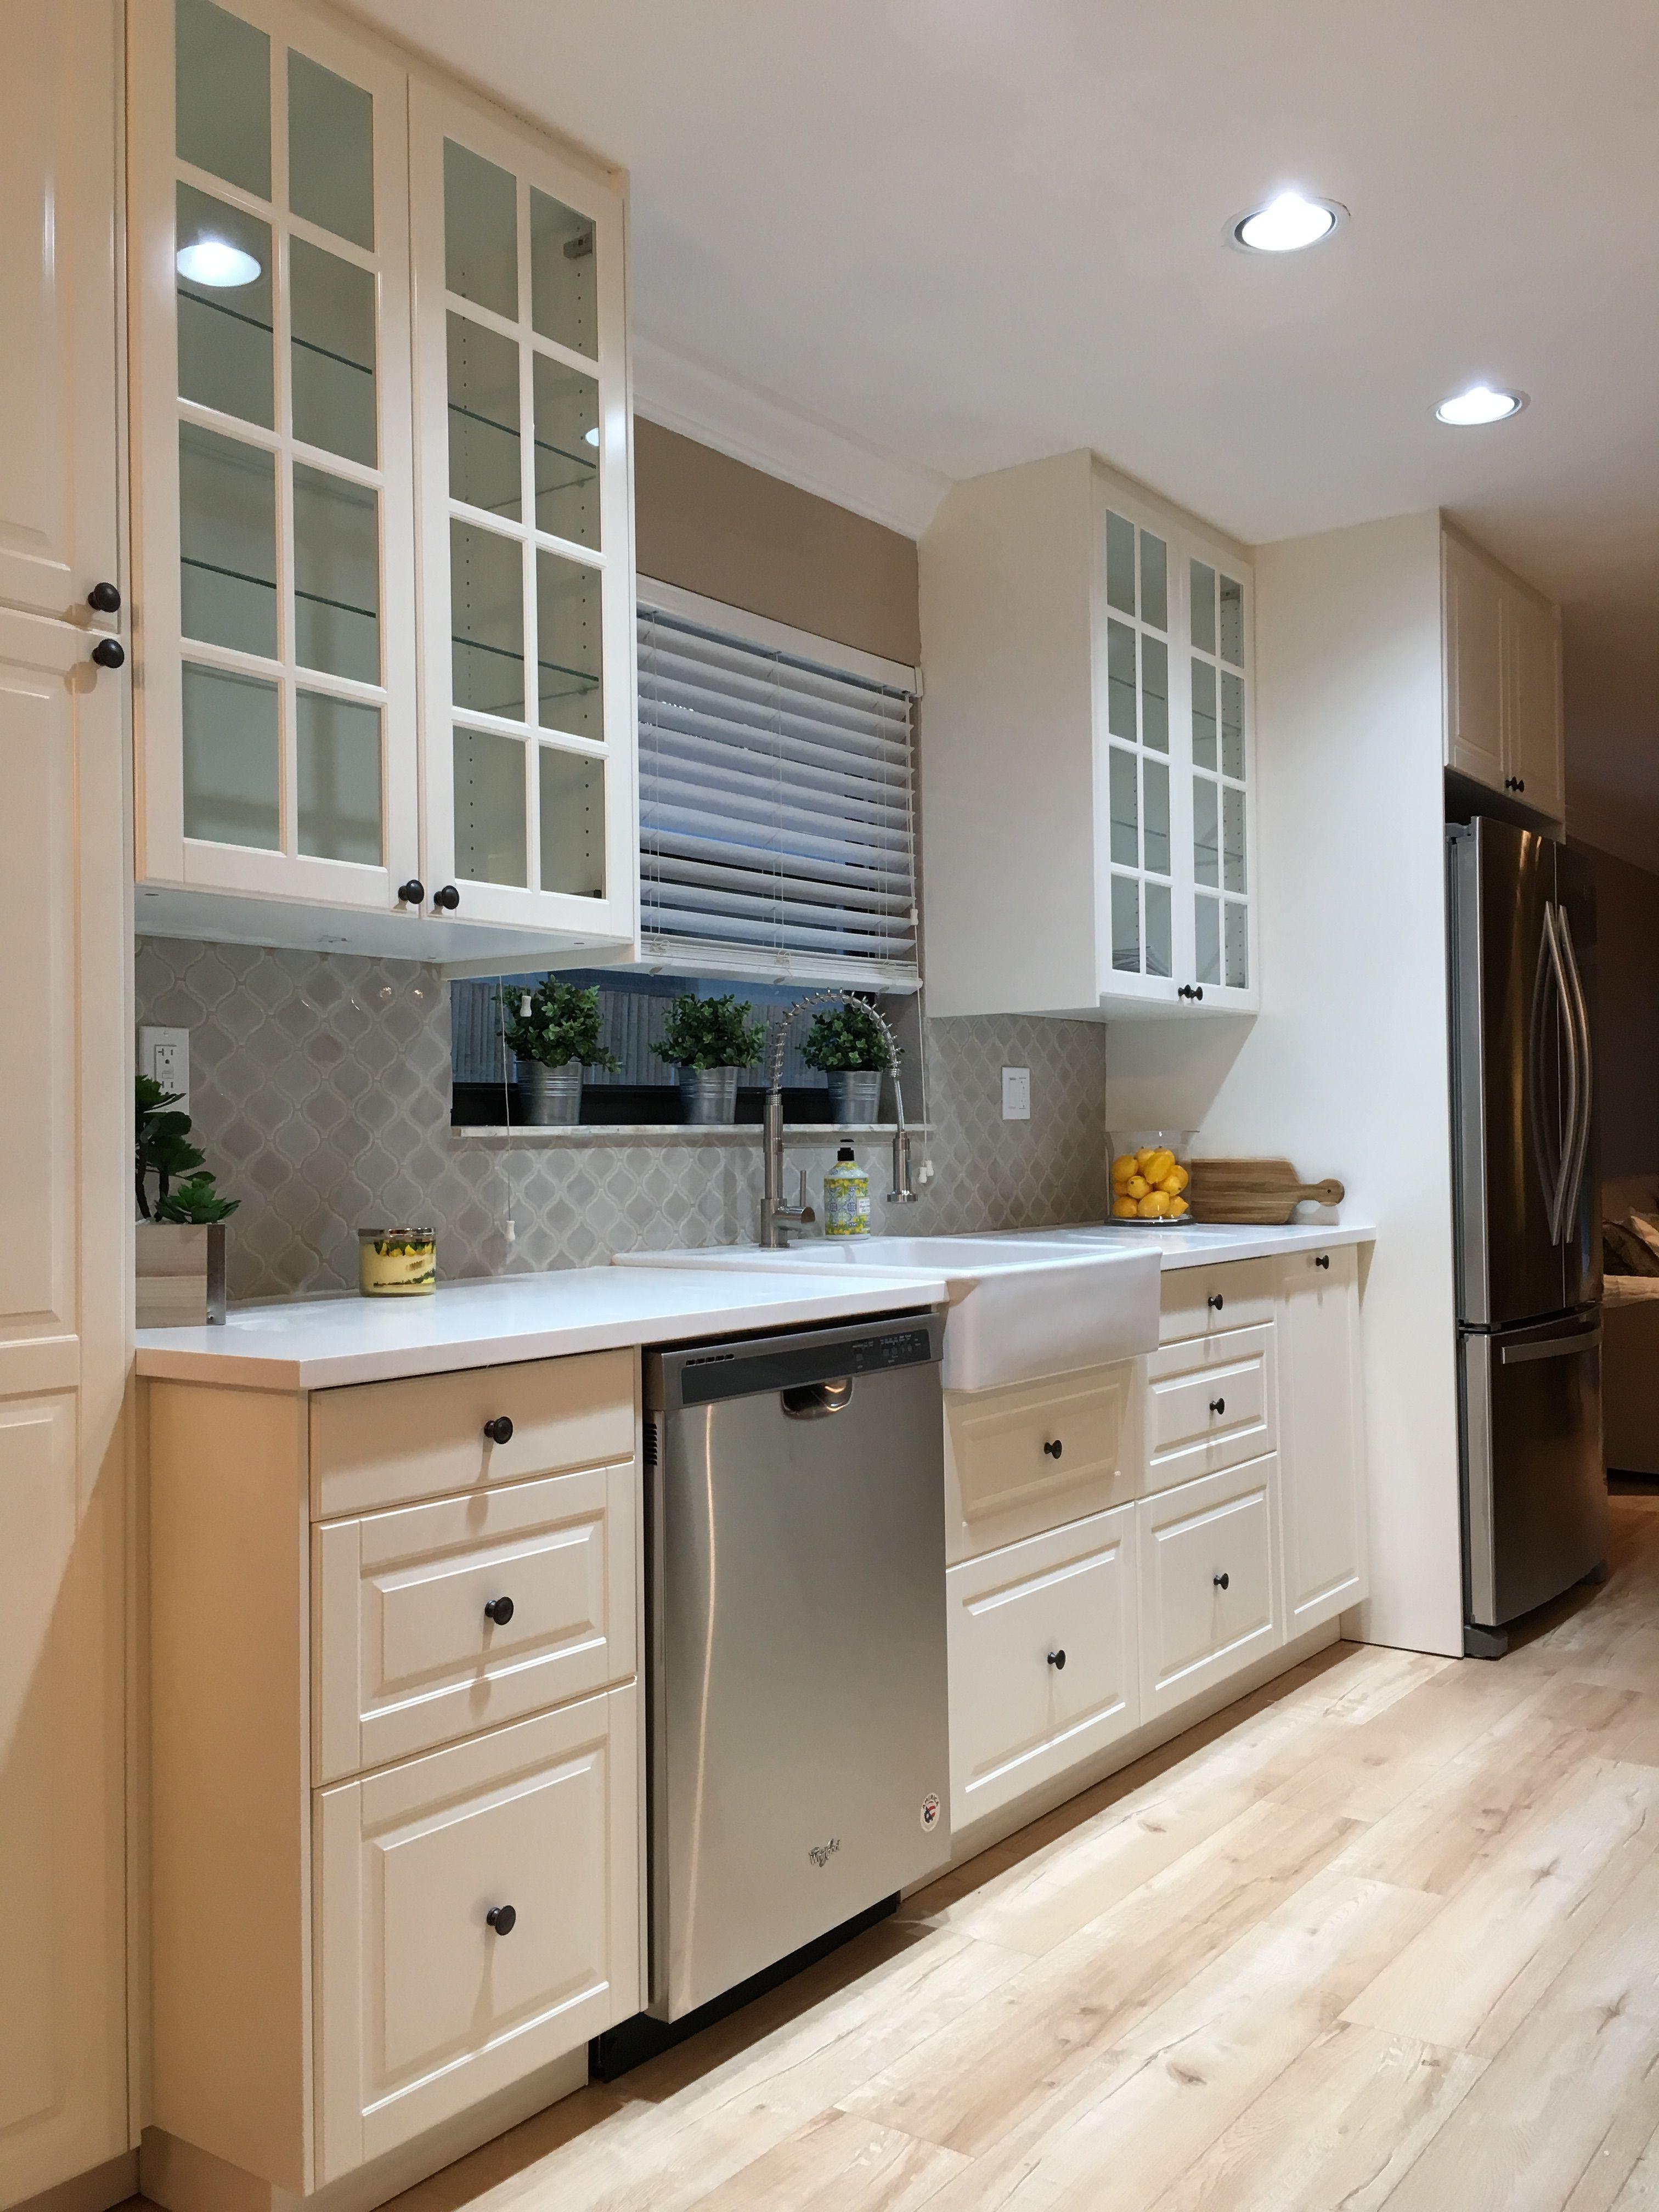 - Ikea White Kitchen With Farm Sink And Grey Arabesque Tile